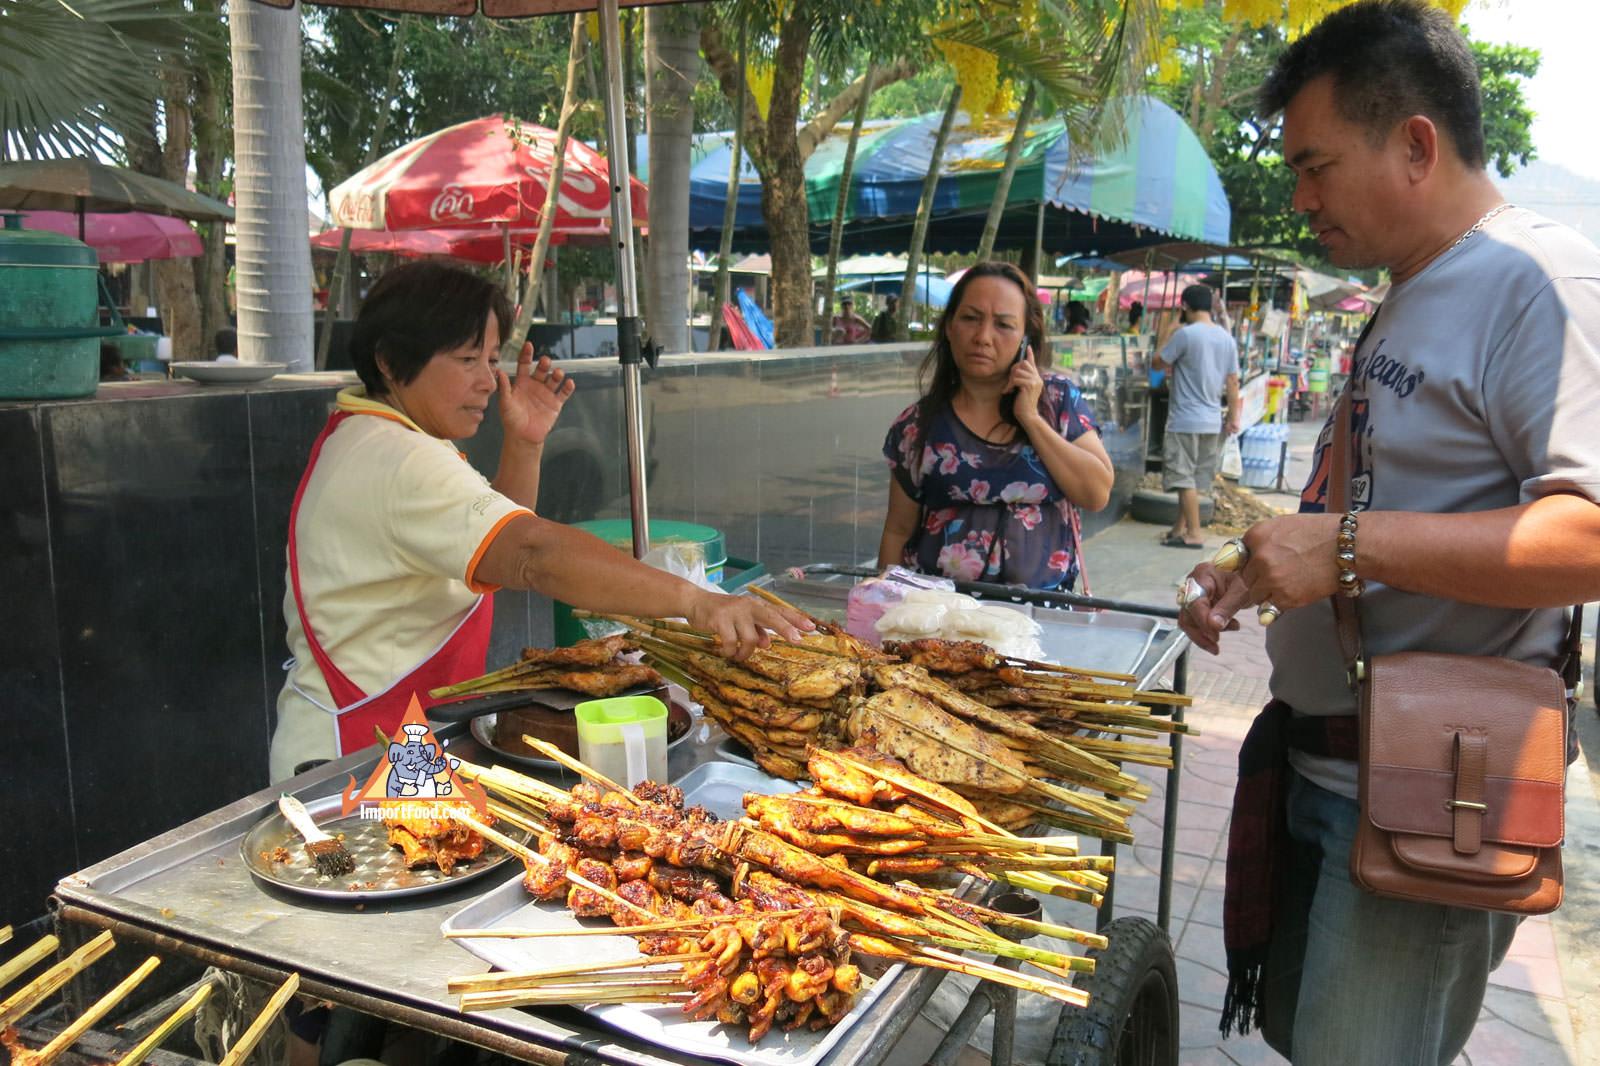 Vendor Talks About Gai Yang Importfood